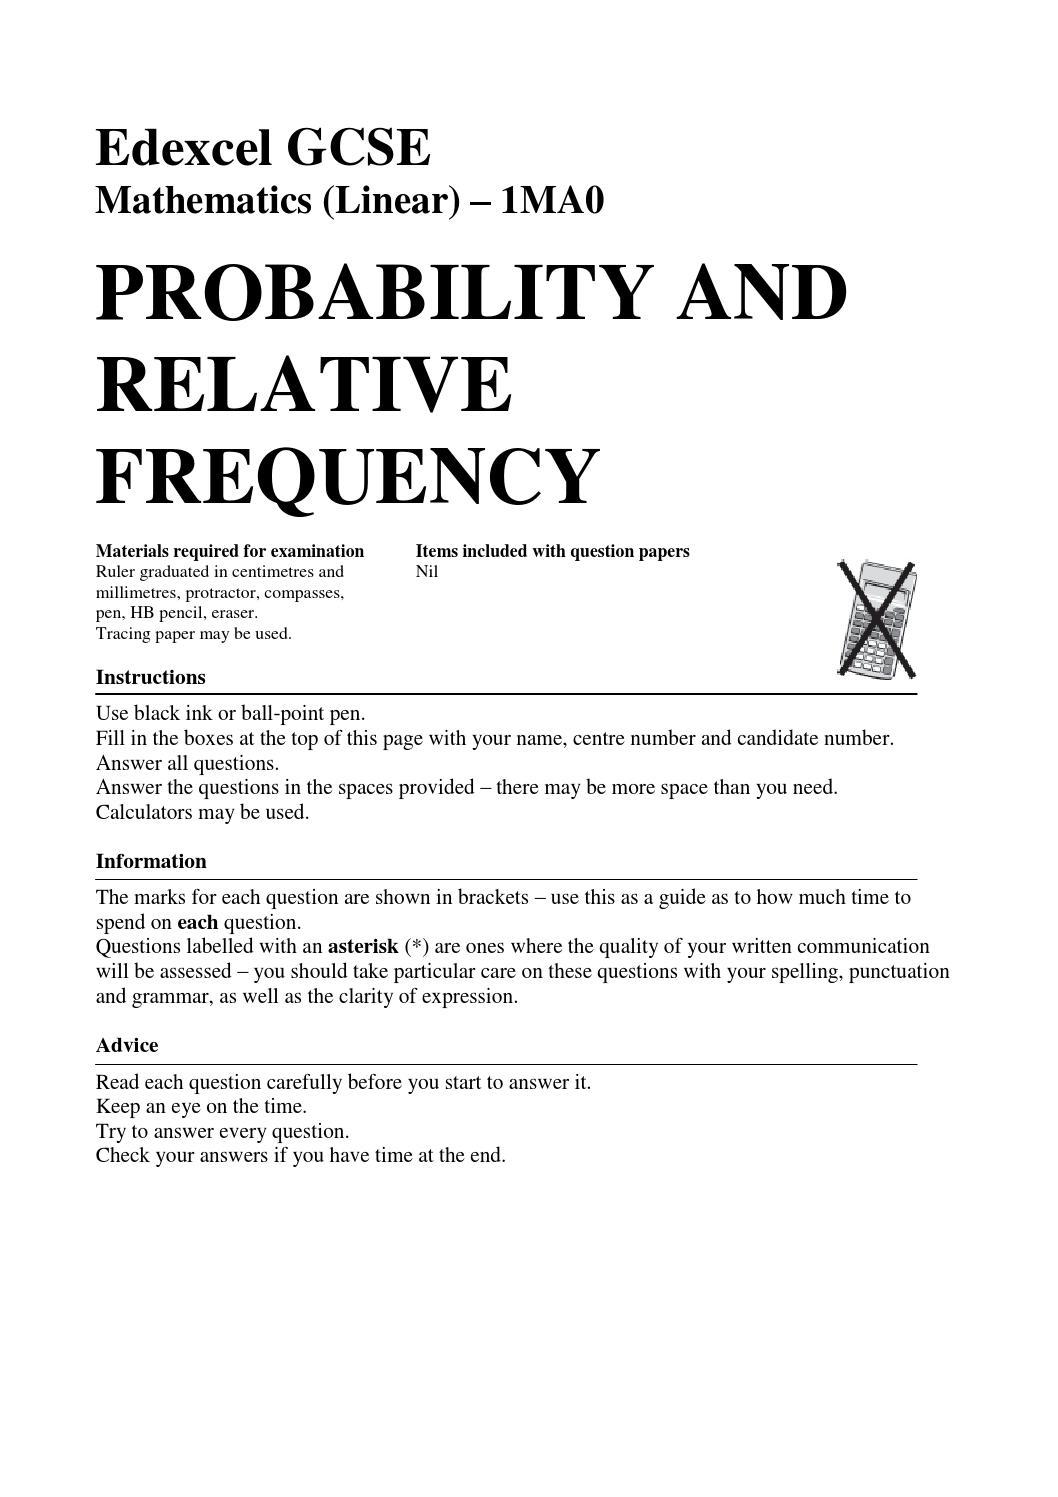 1mao2h array 54 edexcel gcse mathematics linear 1mao frequency tables tables rh mathematics table blogspot com fandeluxe Choice Image